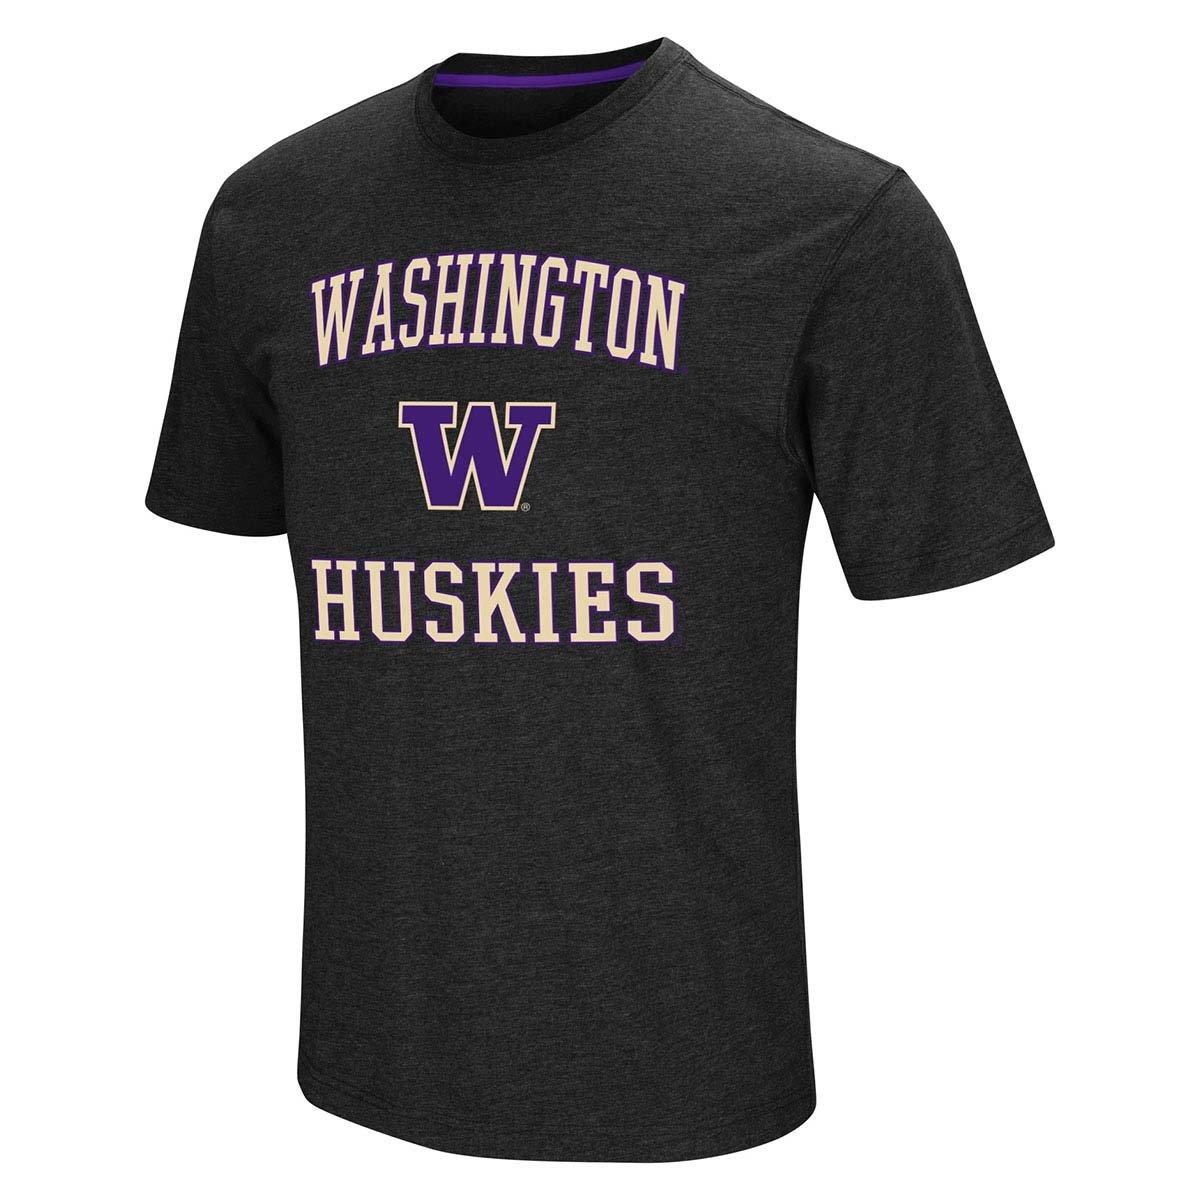 Washington Huskies NCAA Fun Run Tee (Black) L